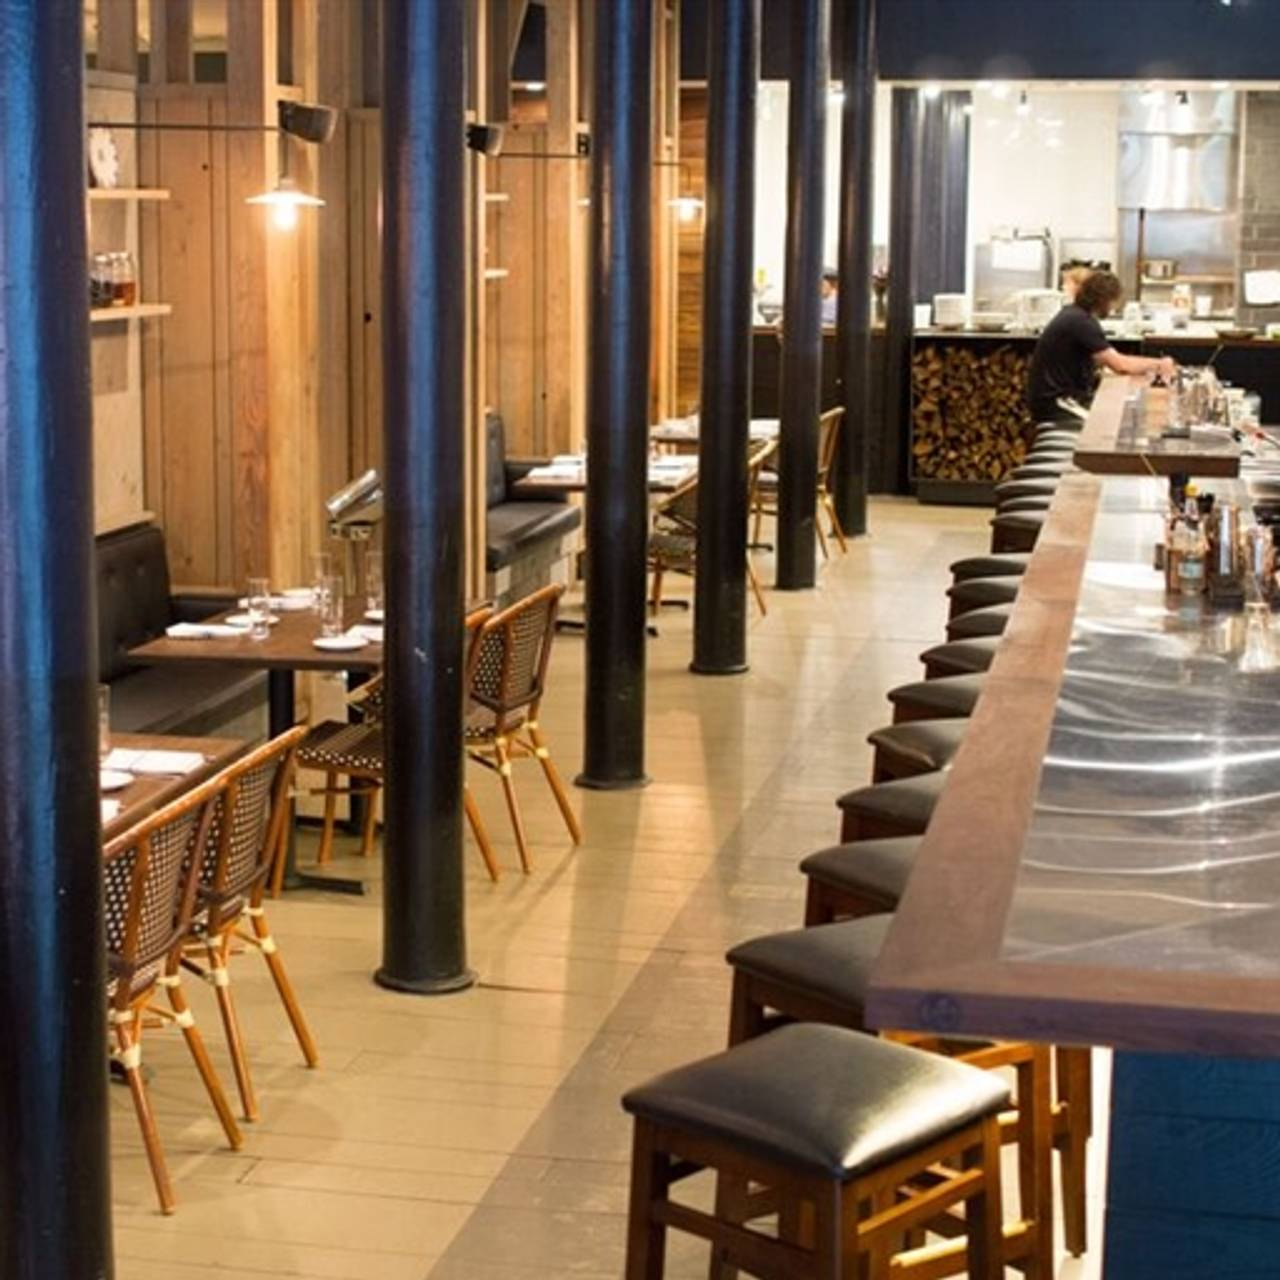 La Cuchara Restaurant - Baltimore, MD | OpenTable